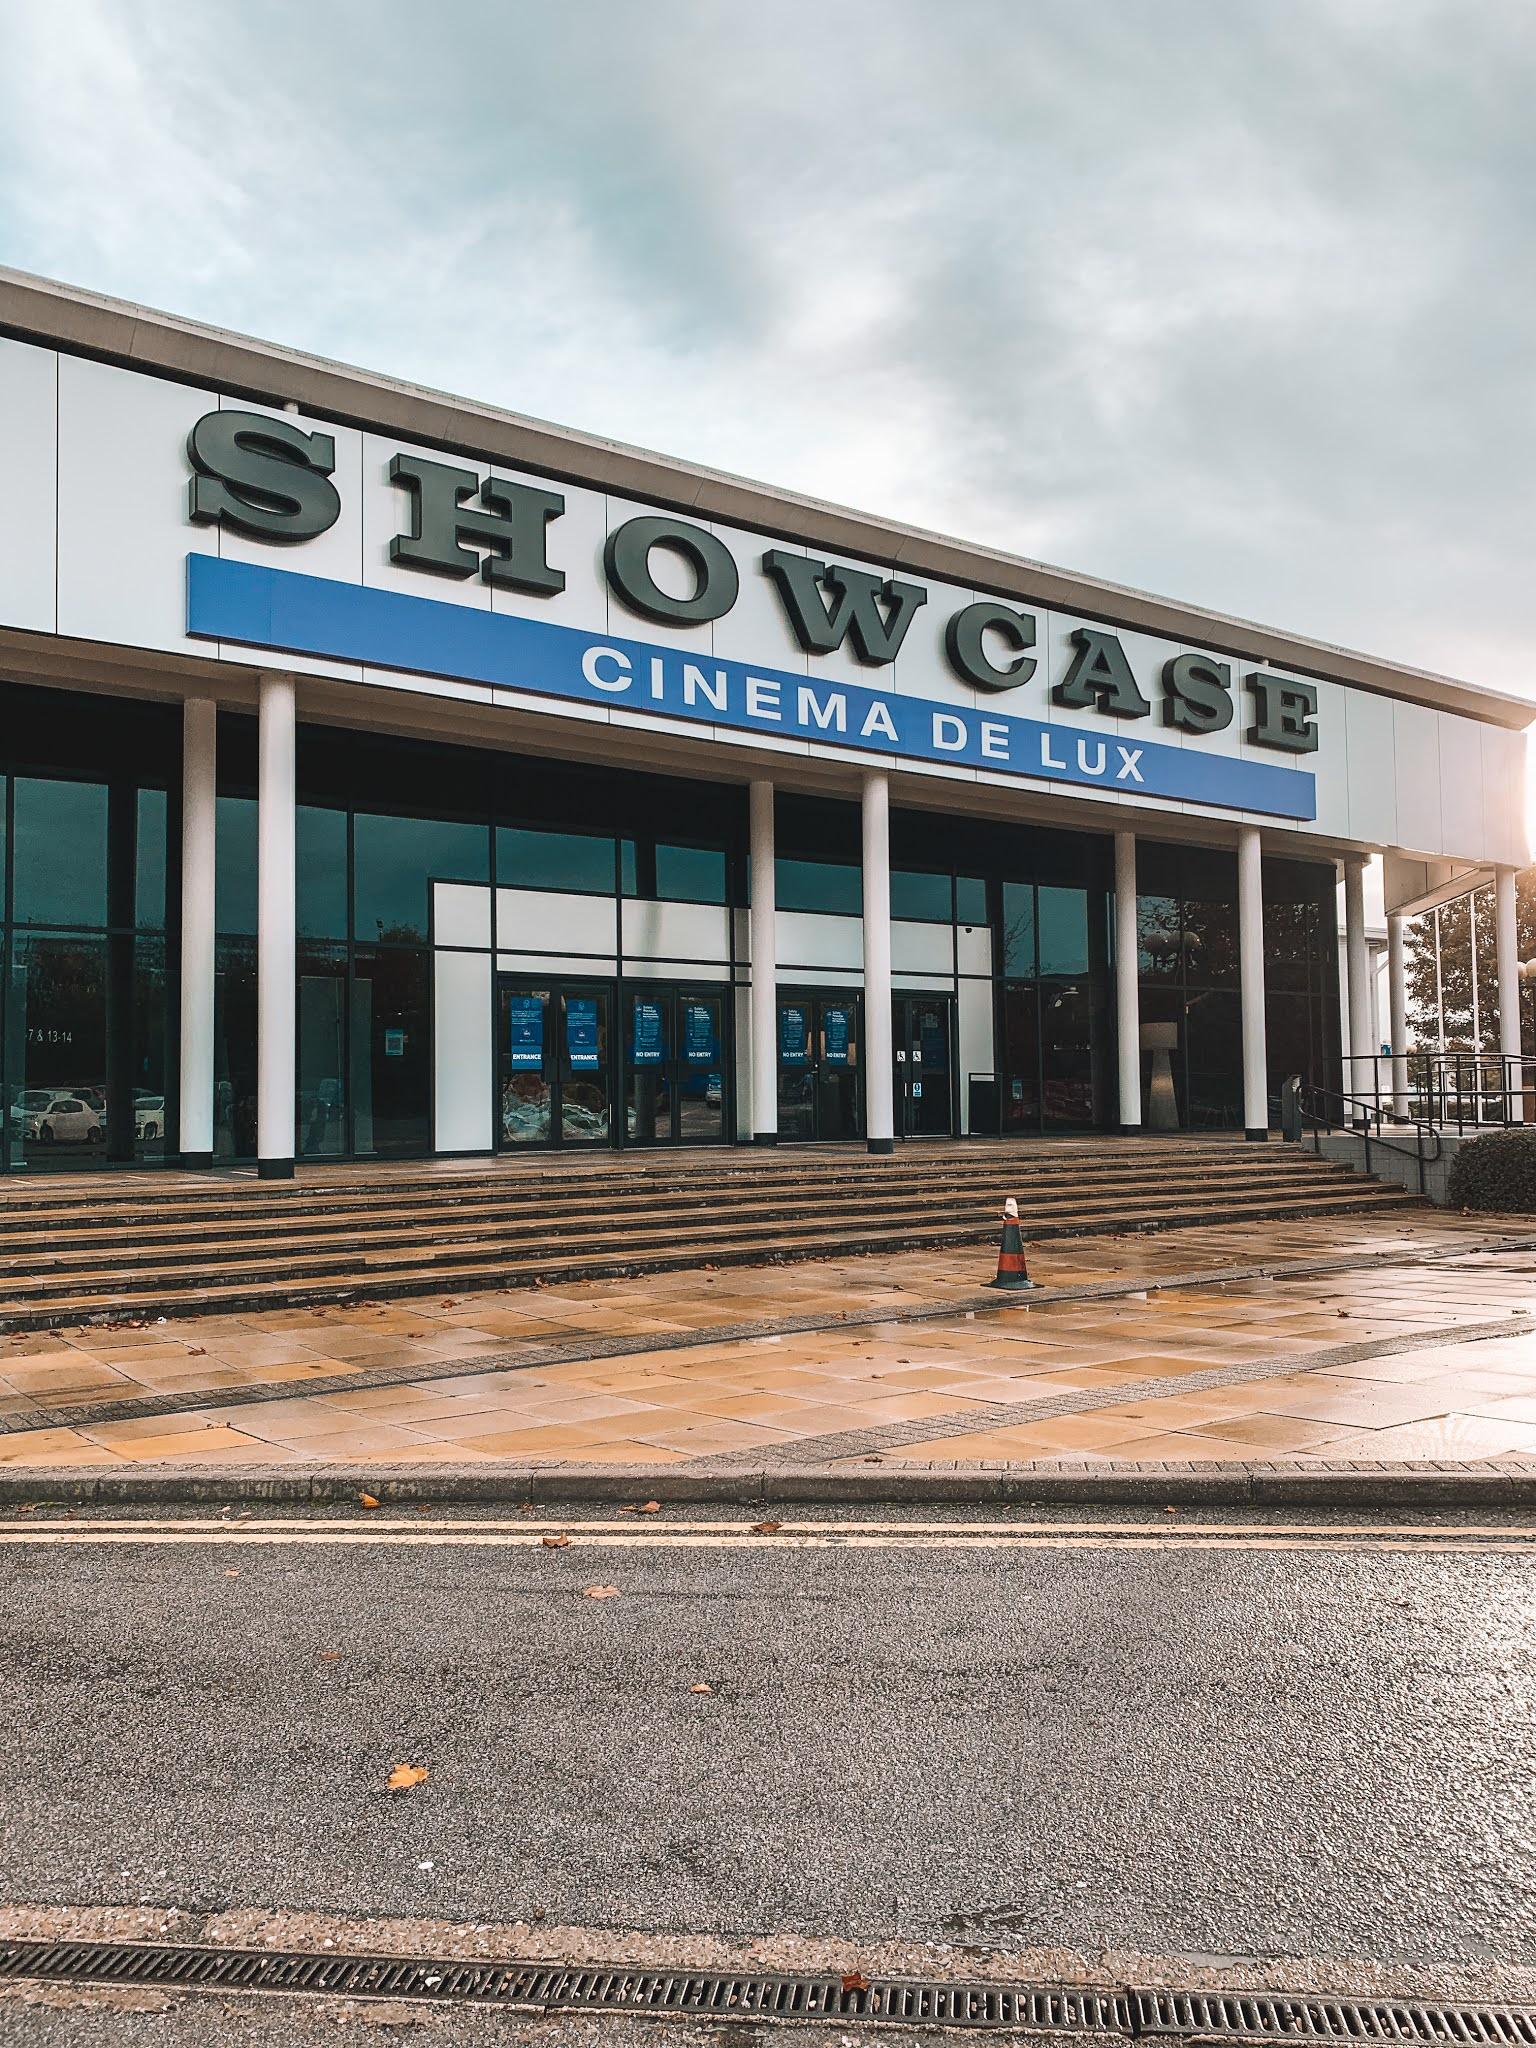 Showcase Cinema